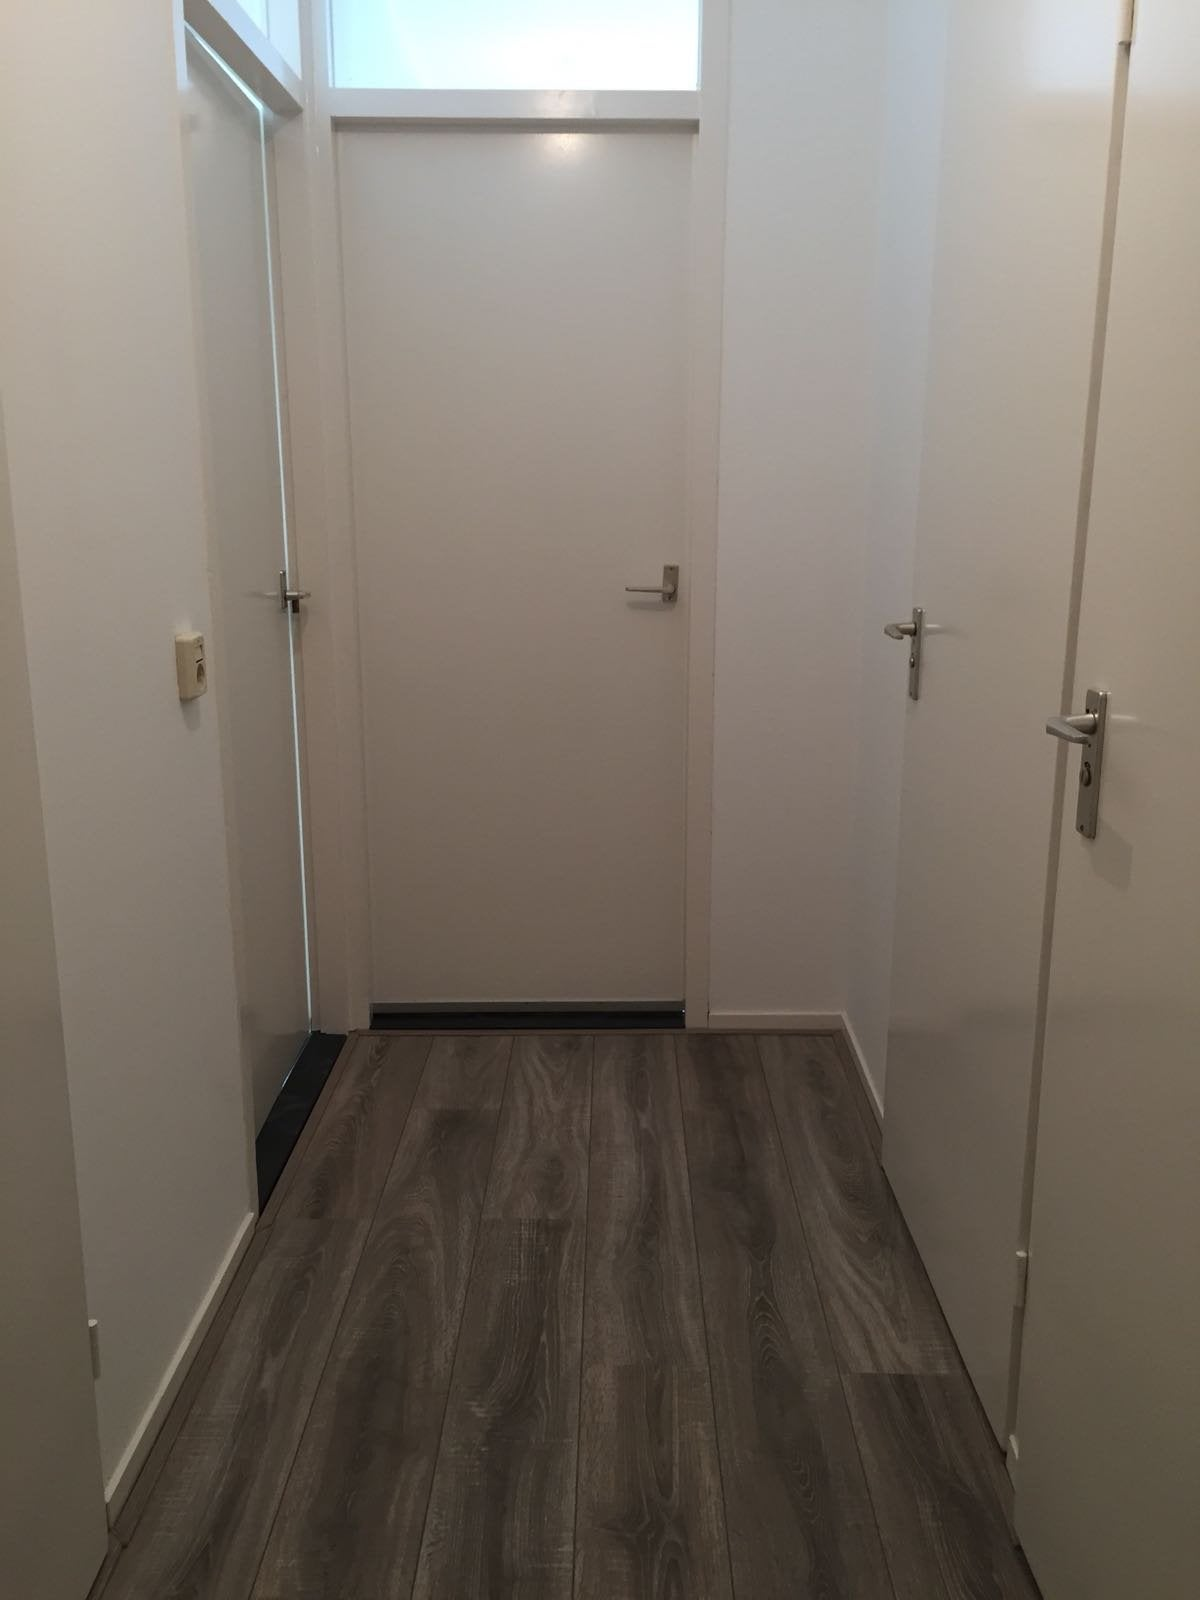 https://public.parariusoffice.nl/298/photos/huge/51421949.1519200054-733.jpeg